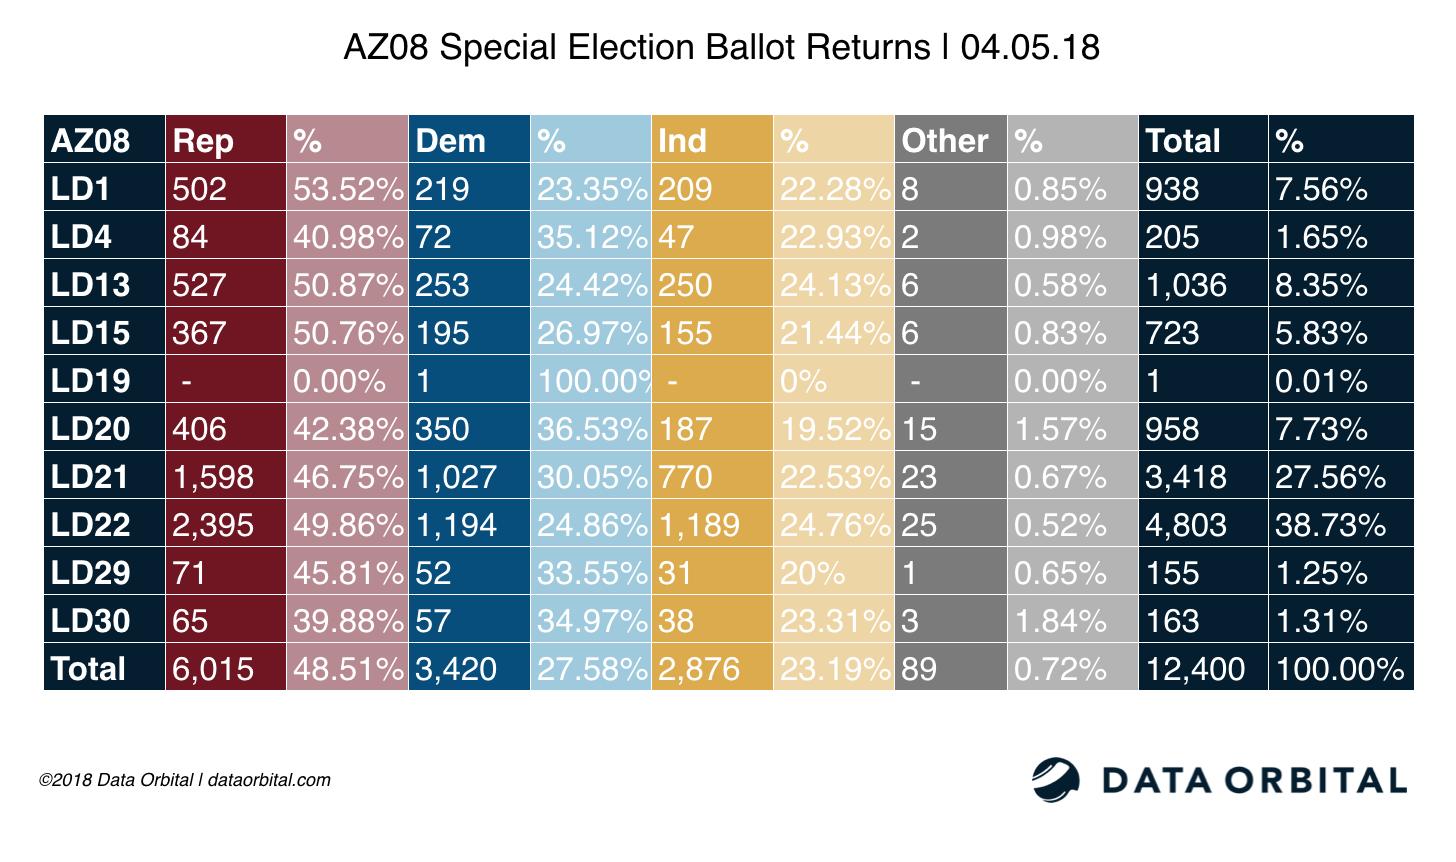 AZ08 Special Election Ballot Returns 04.05.18